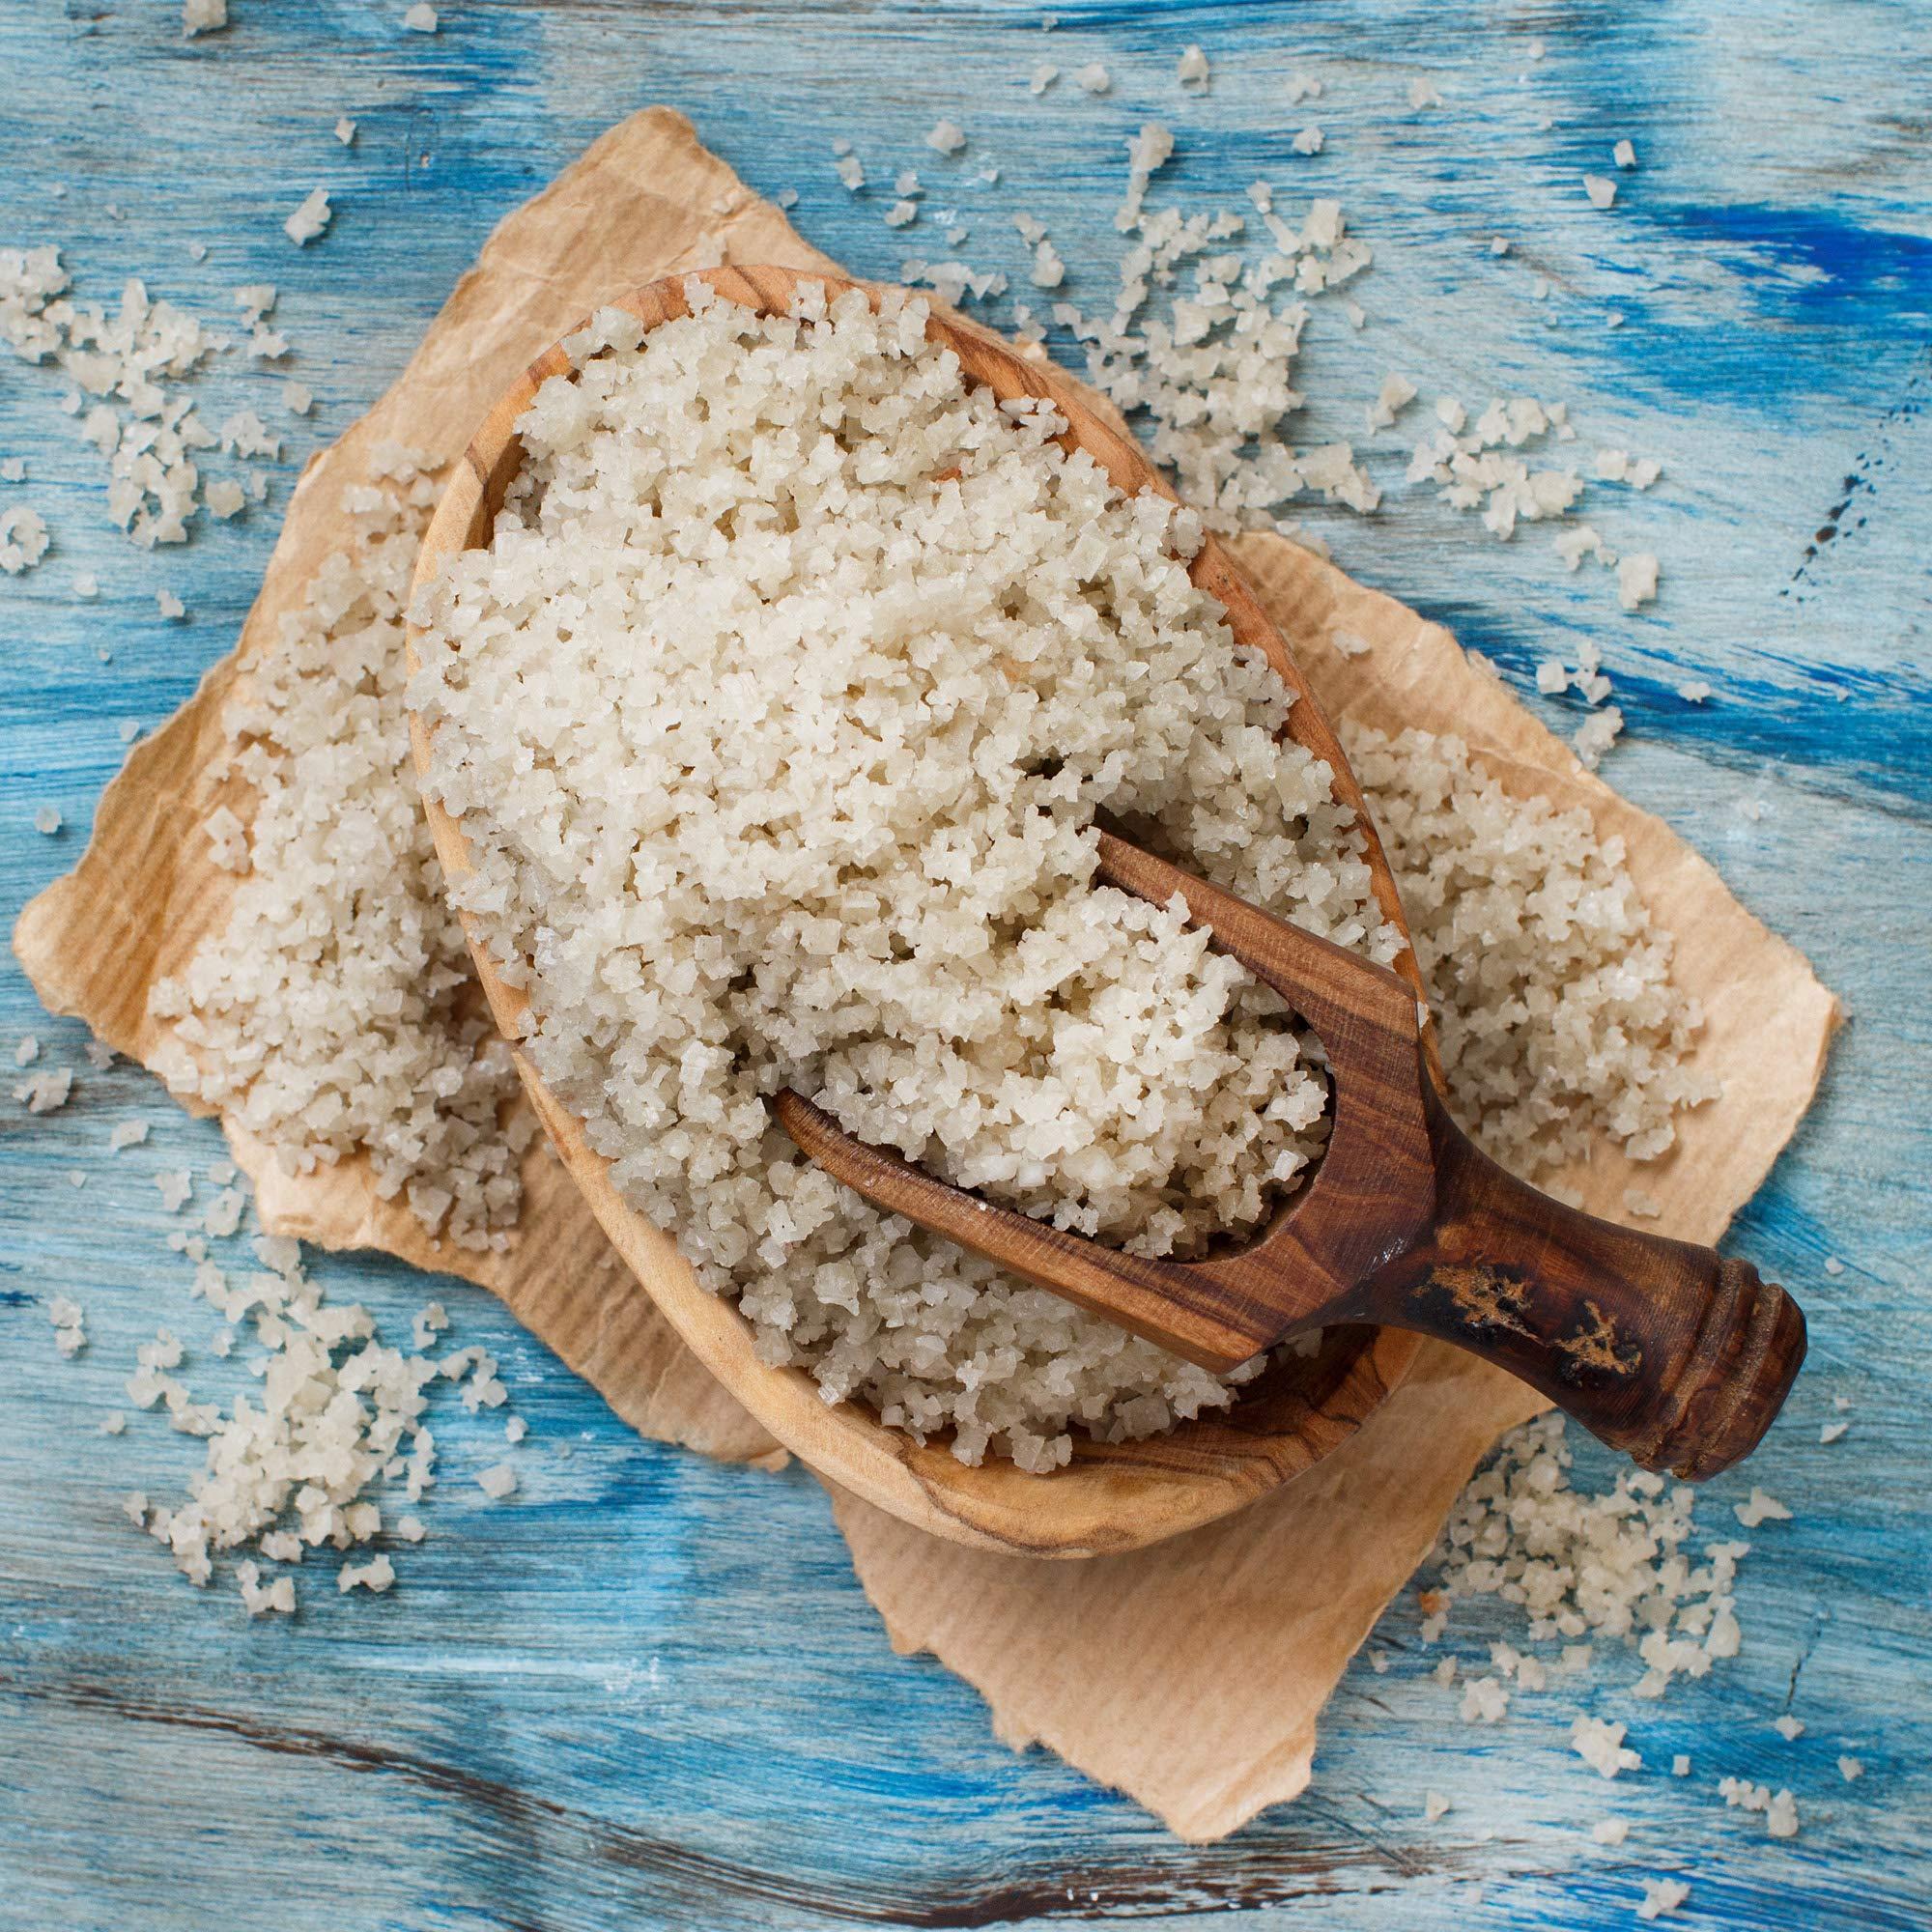 The Spice Lab No. 48 - French Grey Premium Gourmet Salt - Coarse - Gluten-Free Non-GMO All Natural Brand - 1 lb Resealable Bag